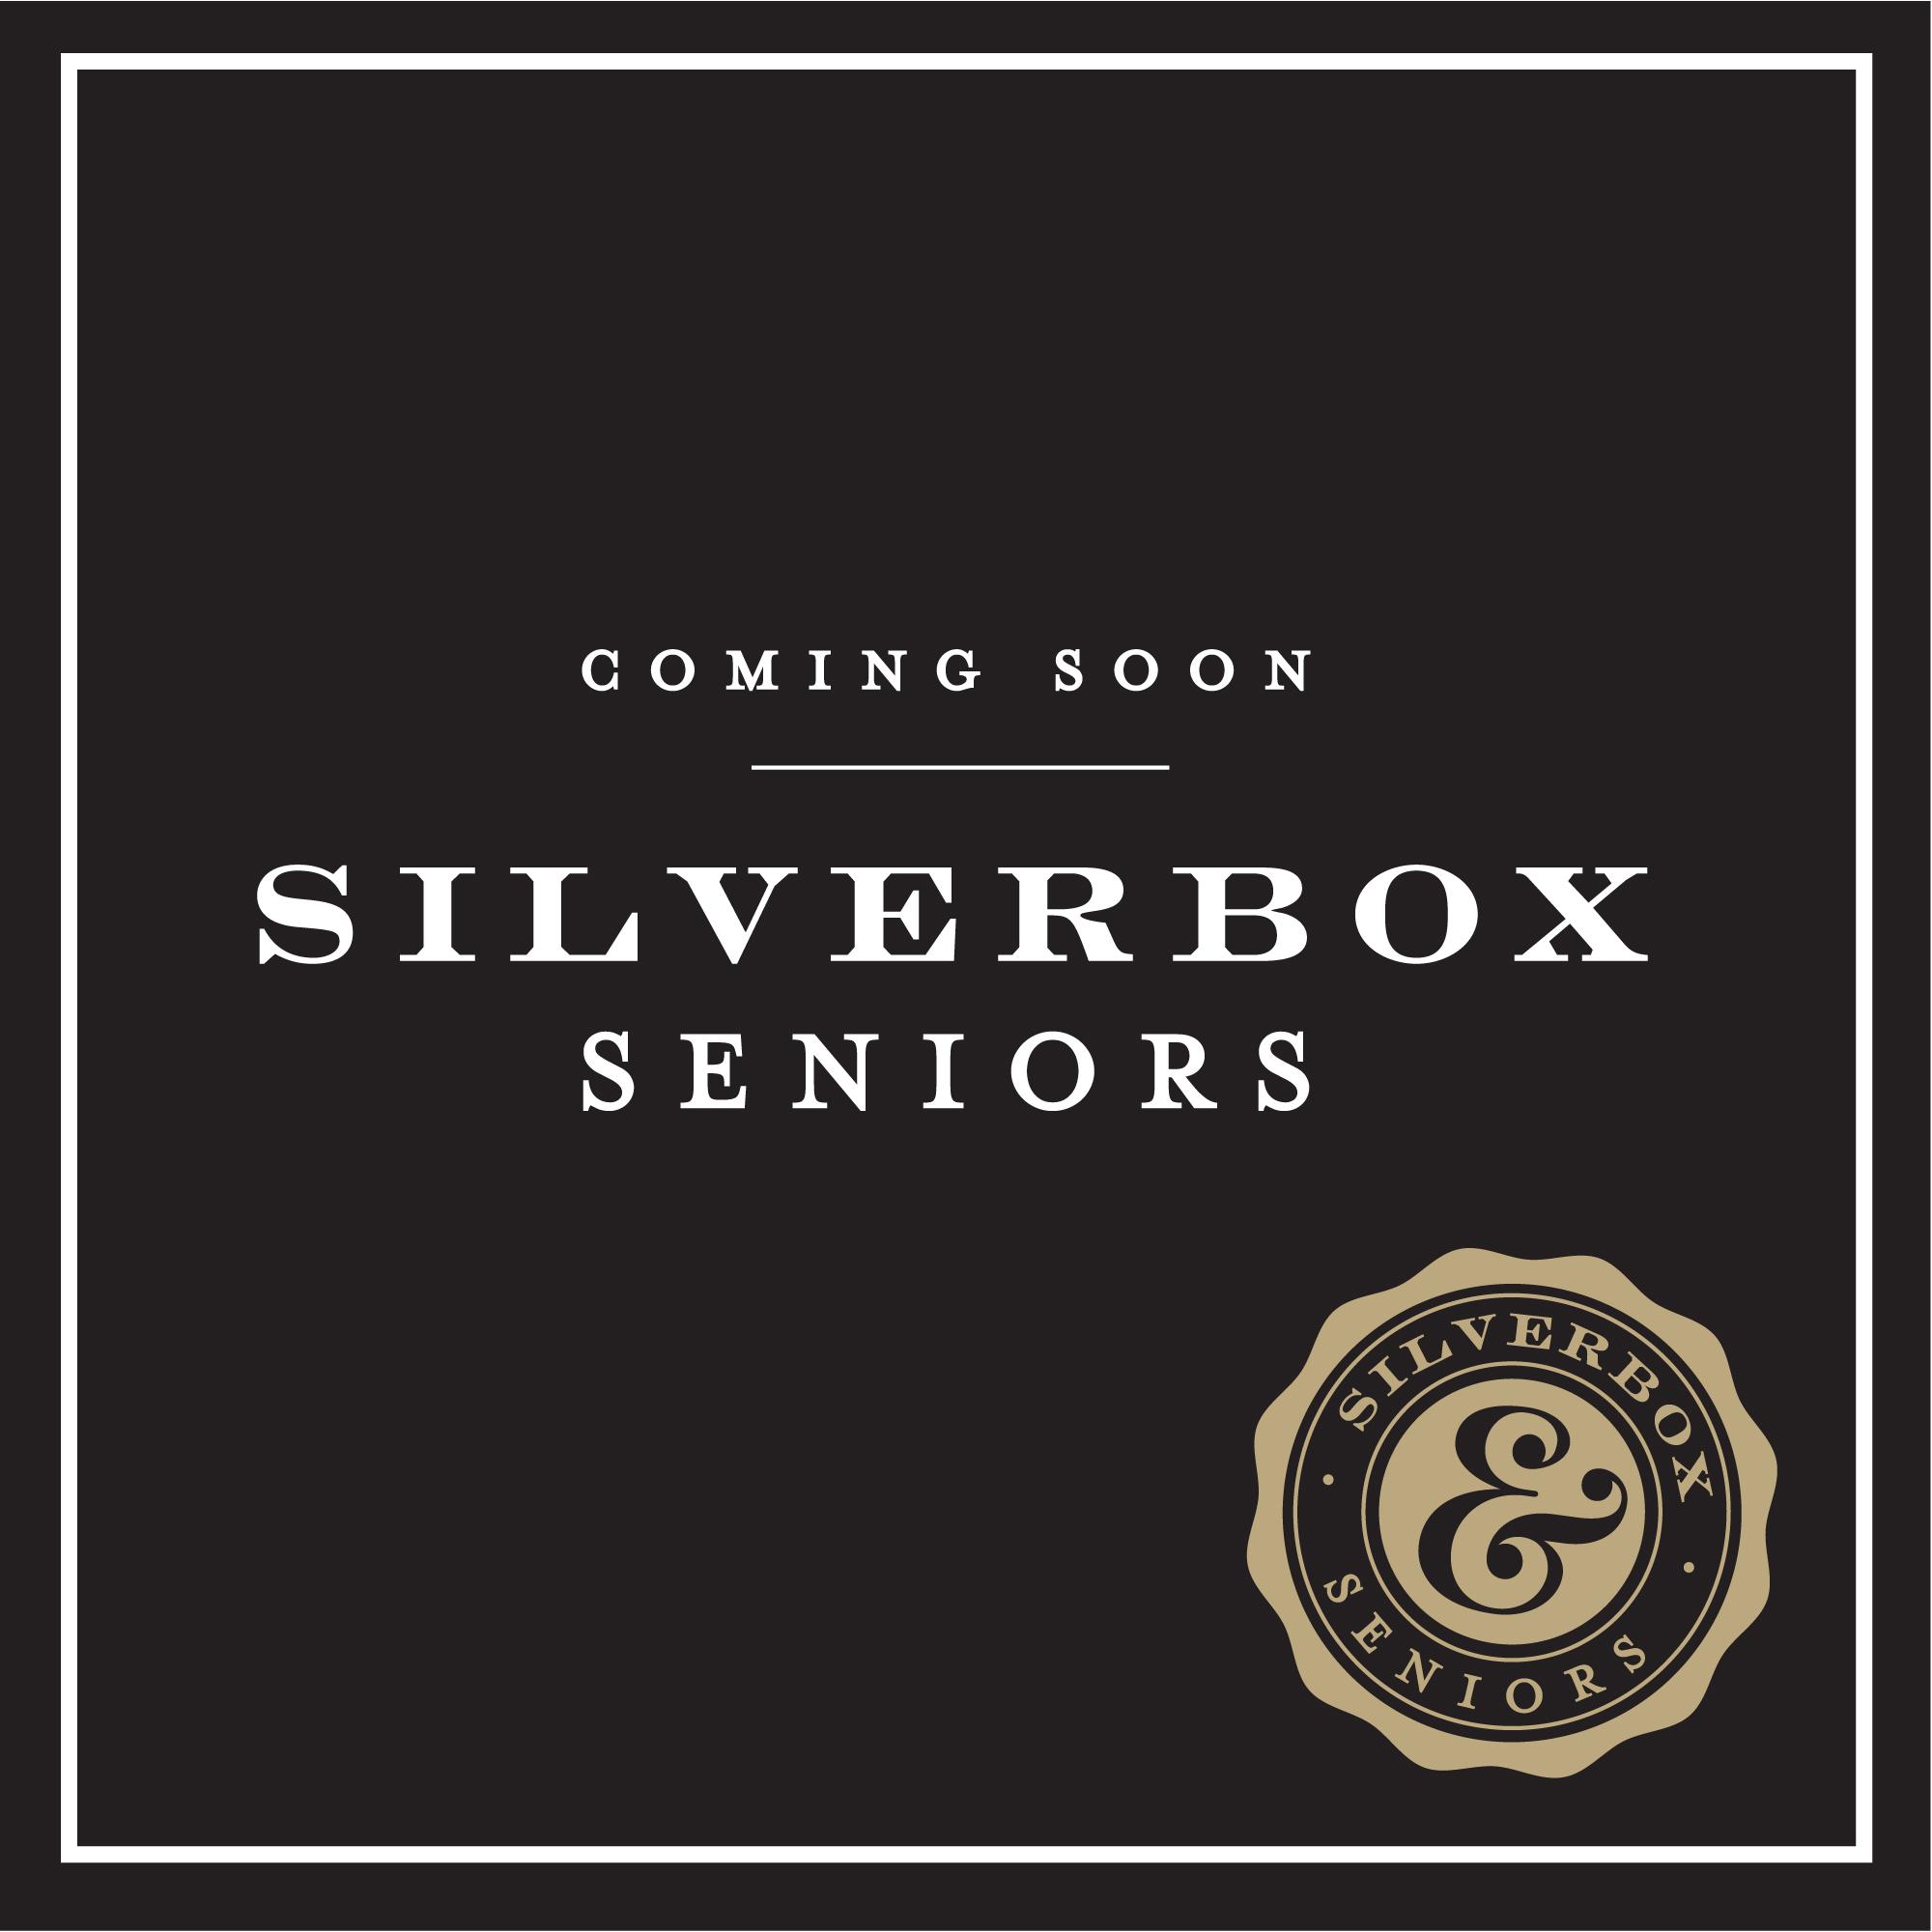 silverbox seniors